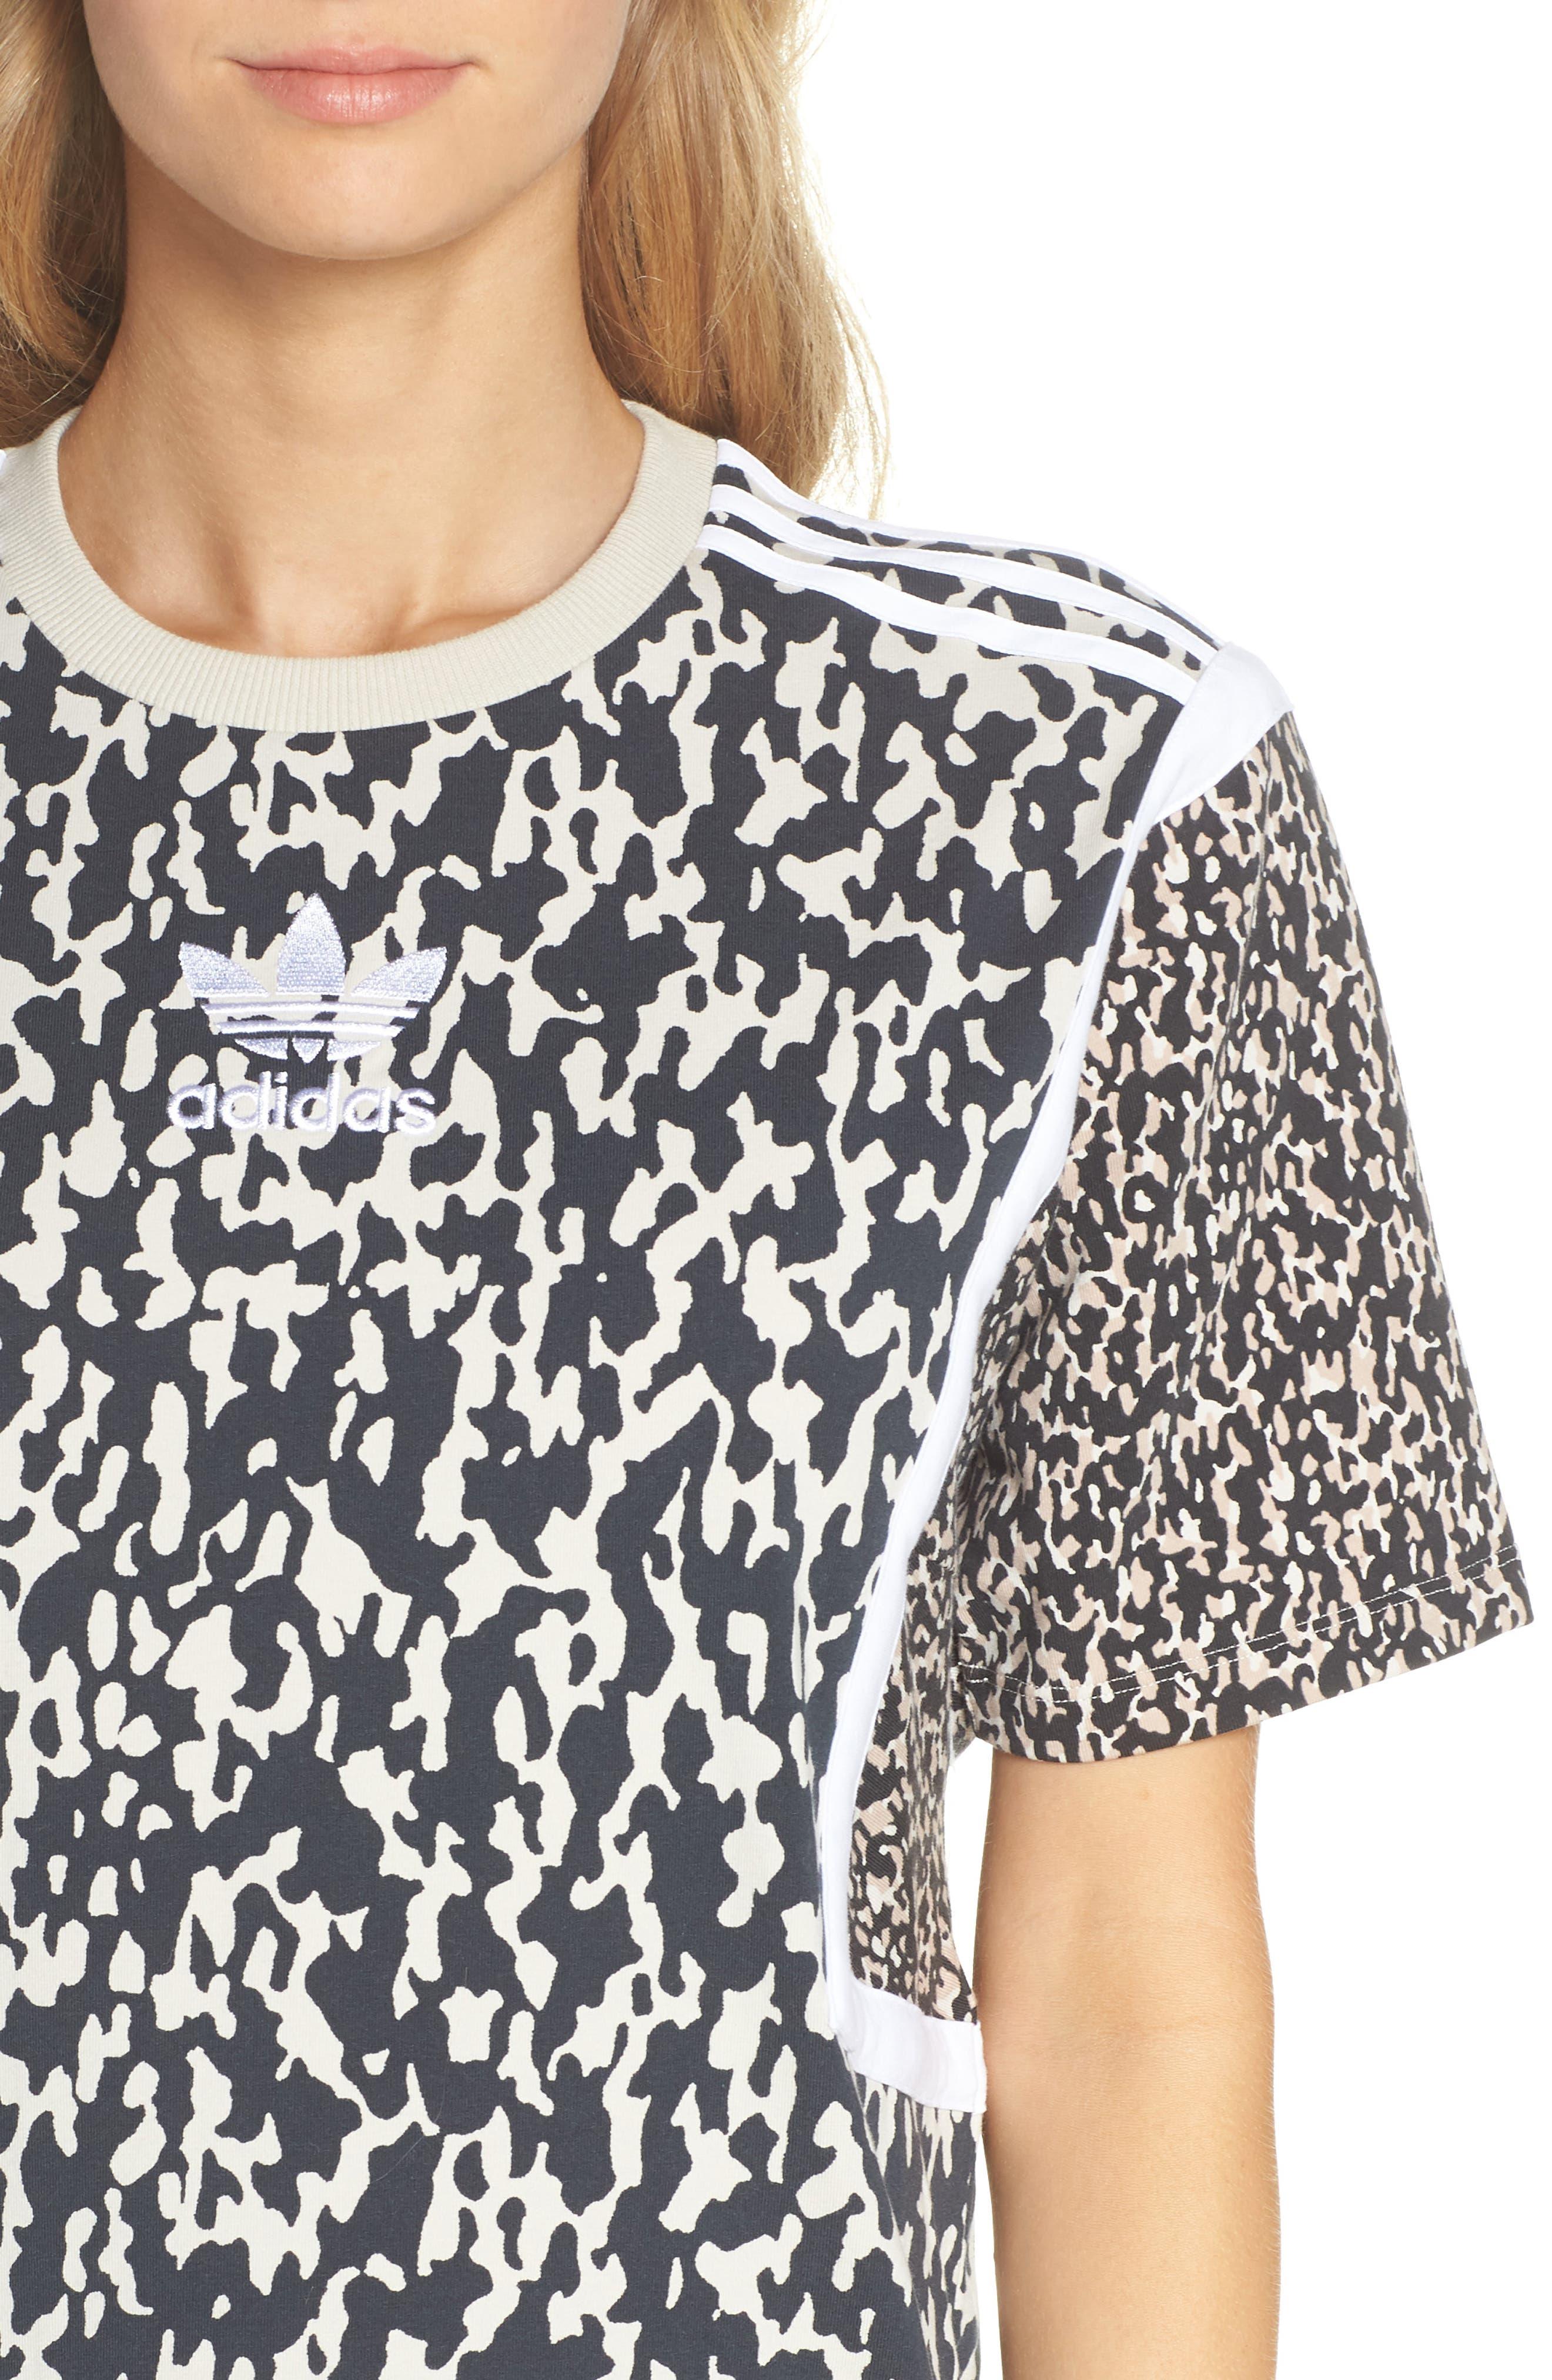 adidas Animal Print Shift Dress,                             Alternate thumbnail 4, color,                             250